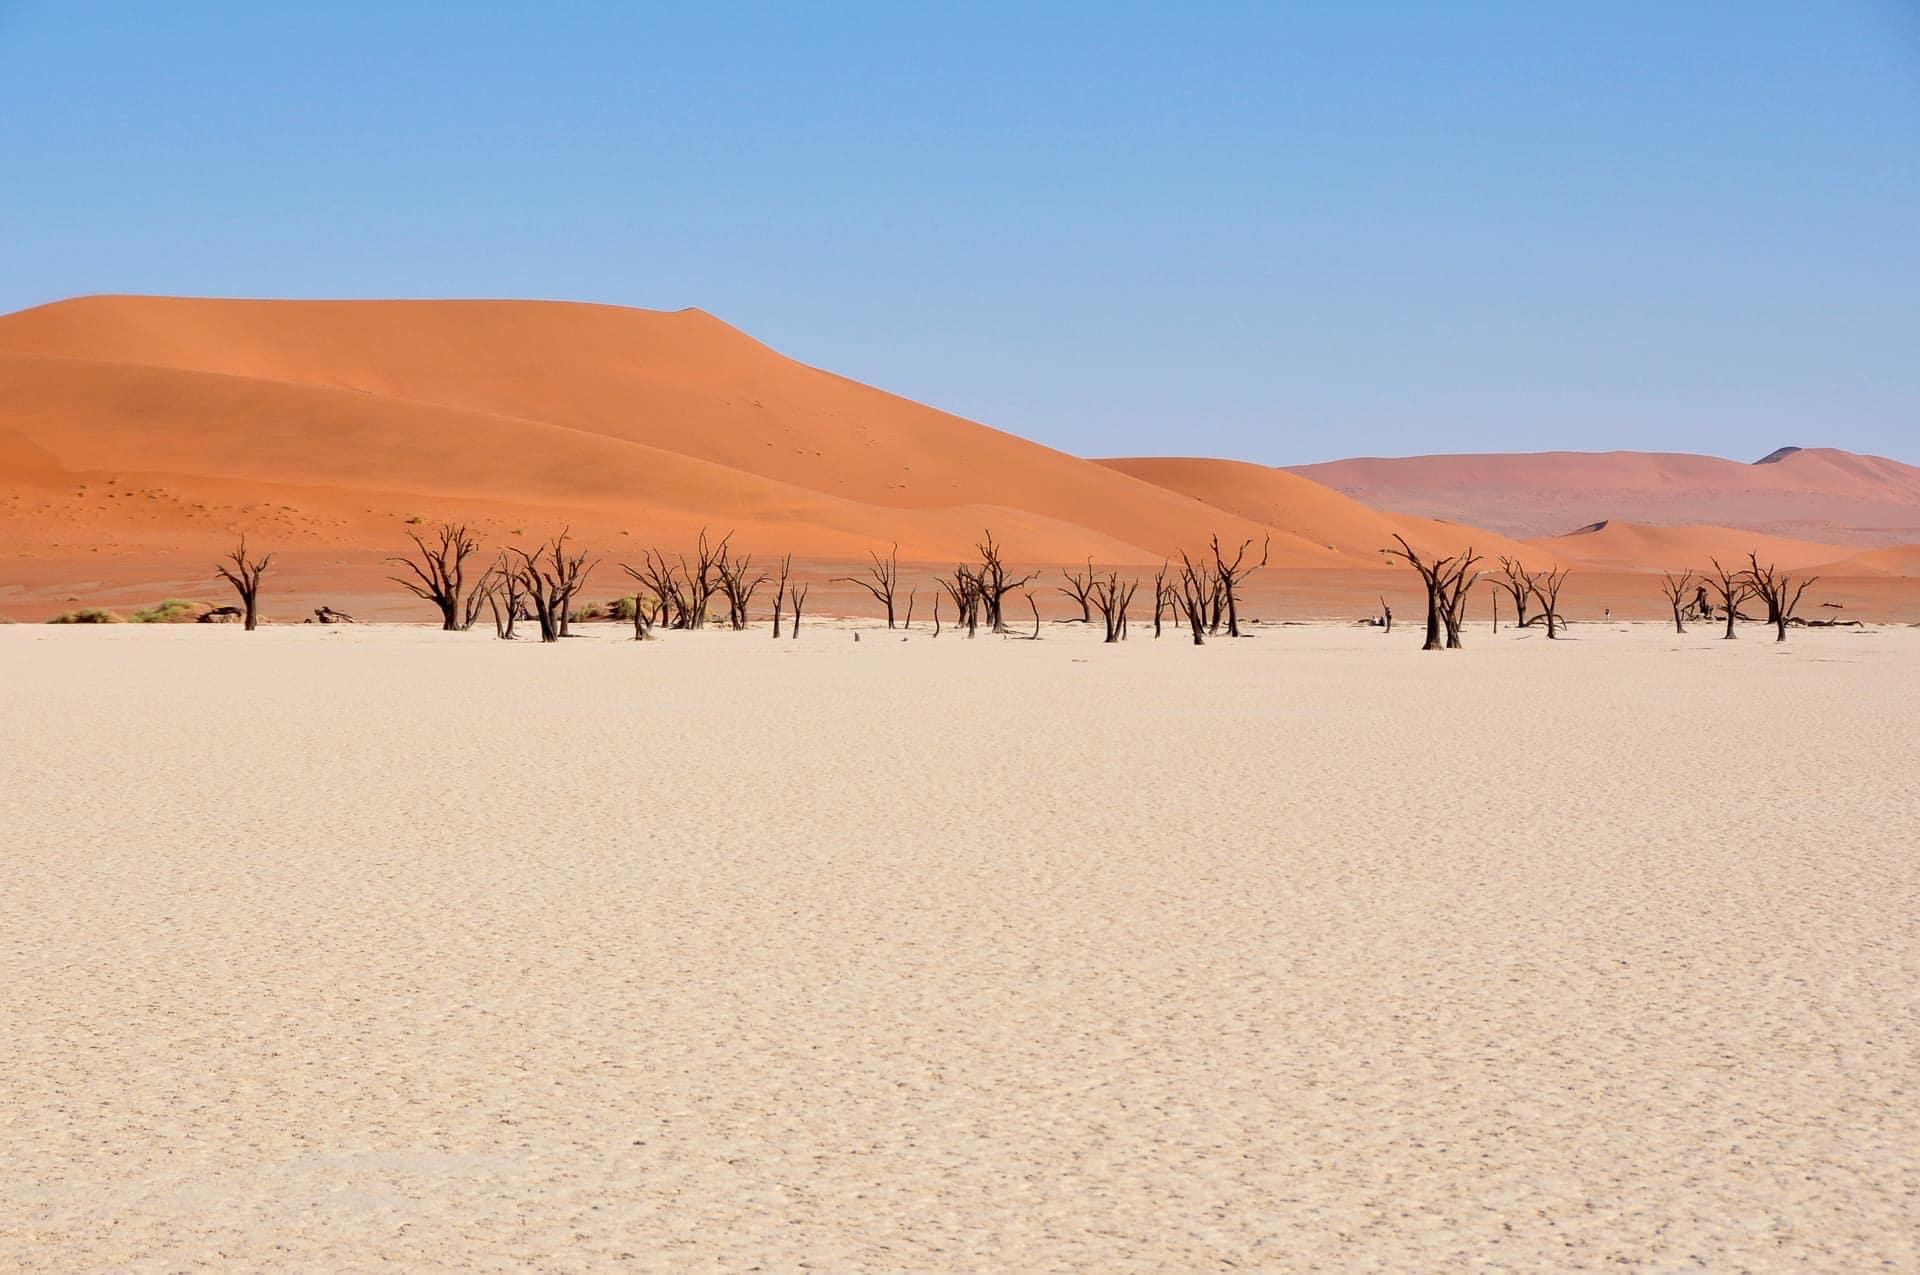 Sossuvlei-Wueste-Namib-Namibia-Globetrotter-Select-32